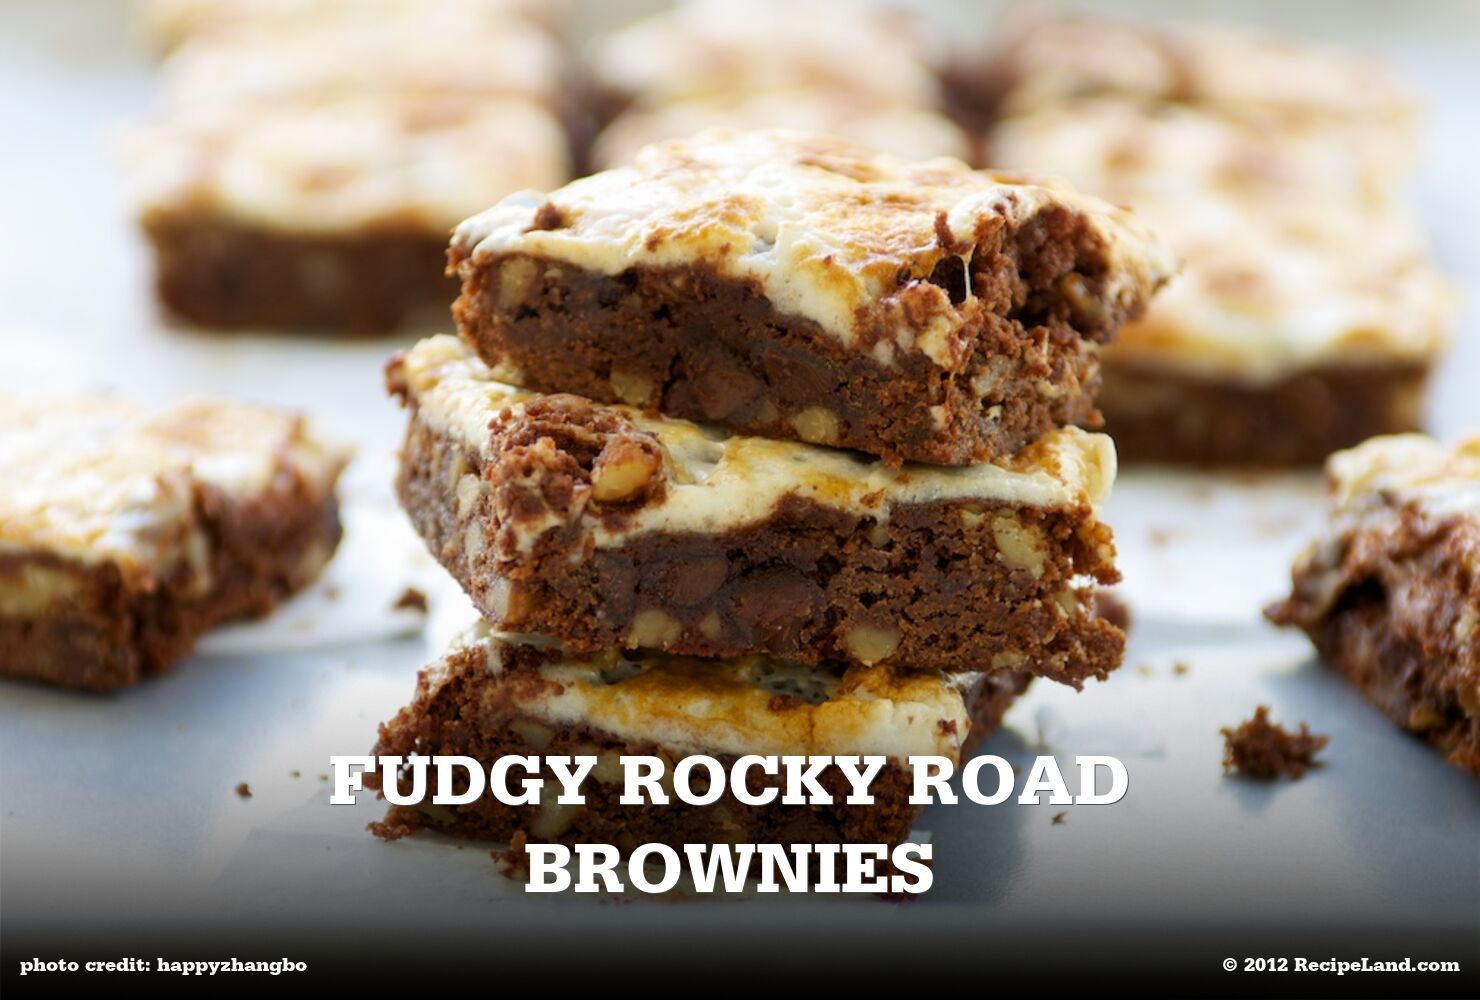 Fudgy Rocky Road Brownies